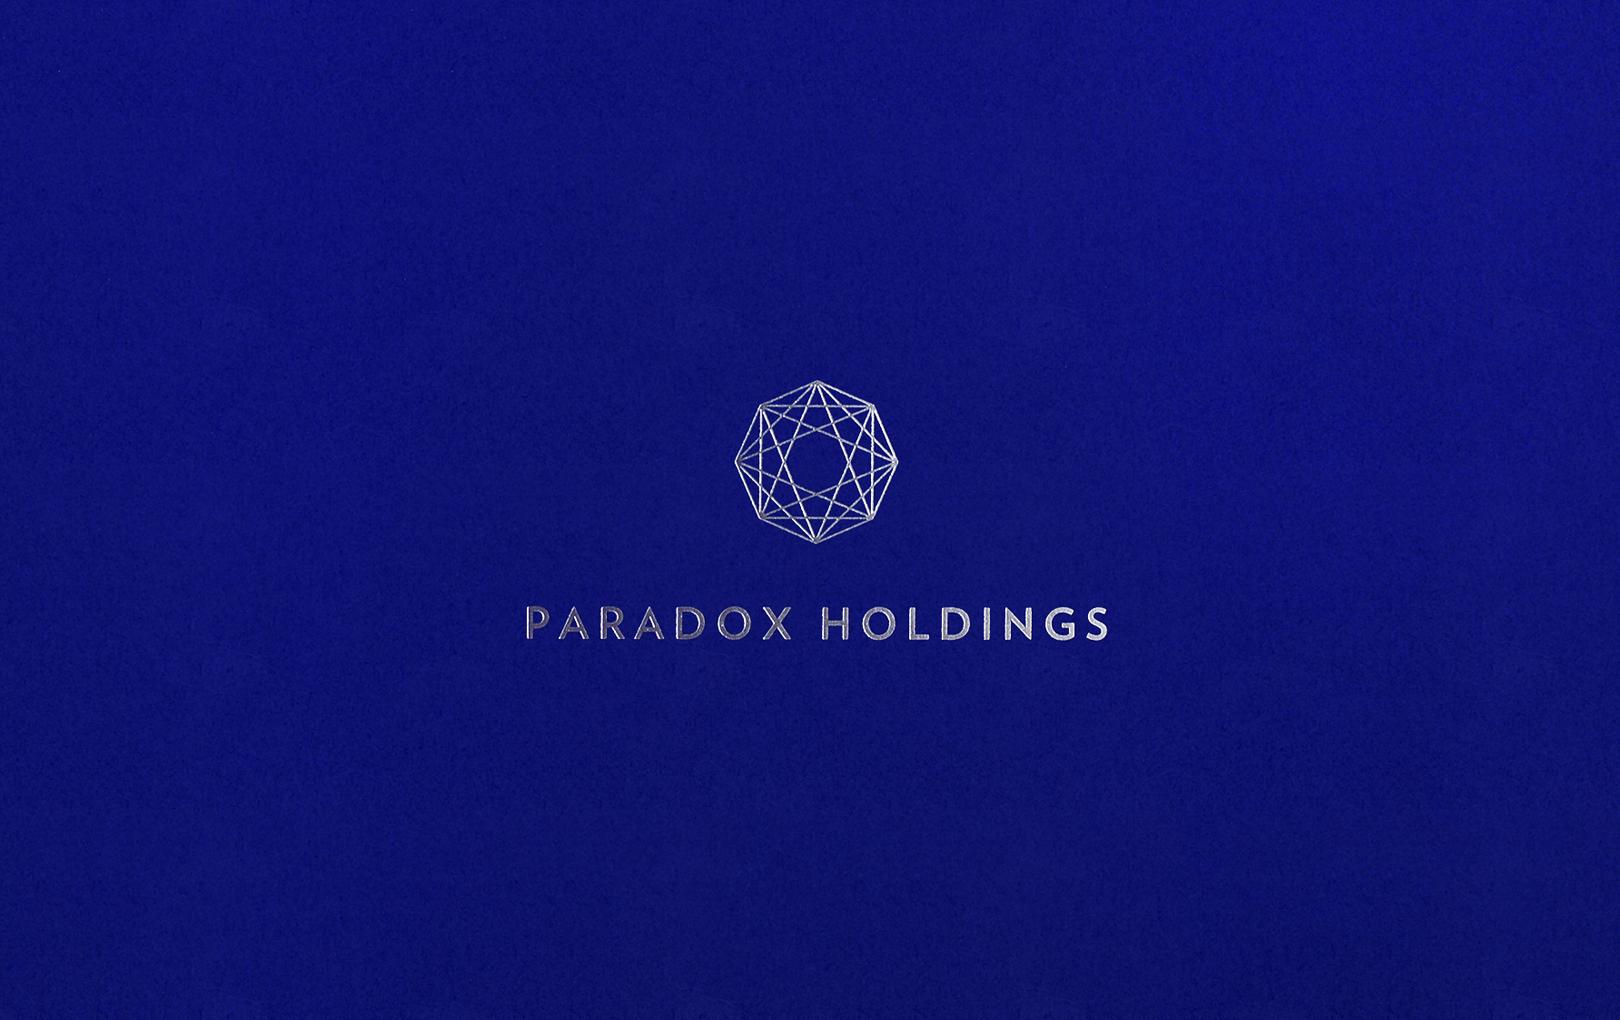 Paradox Holdings